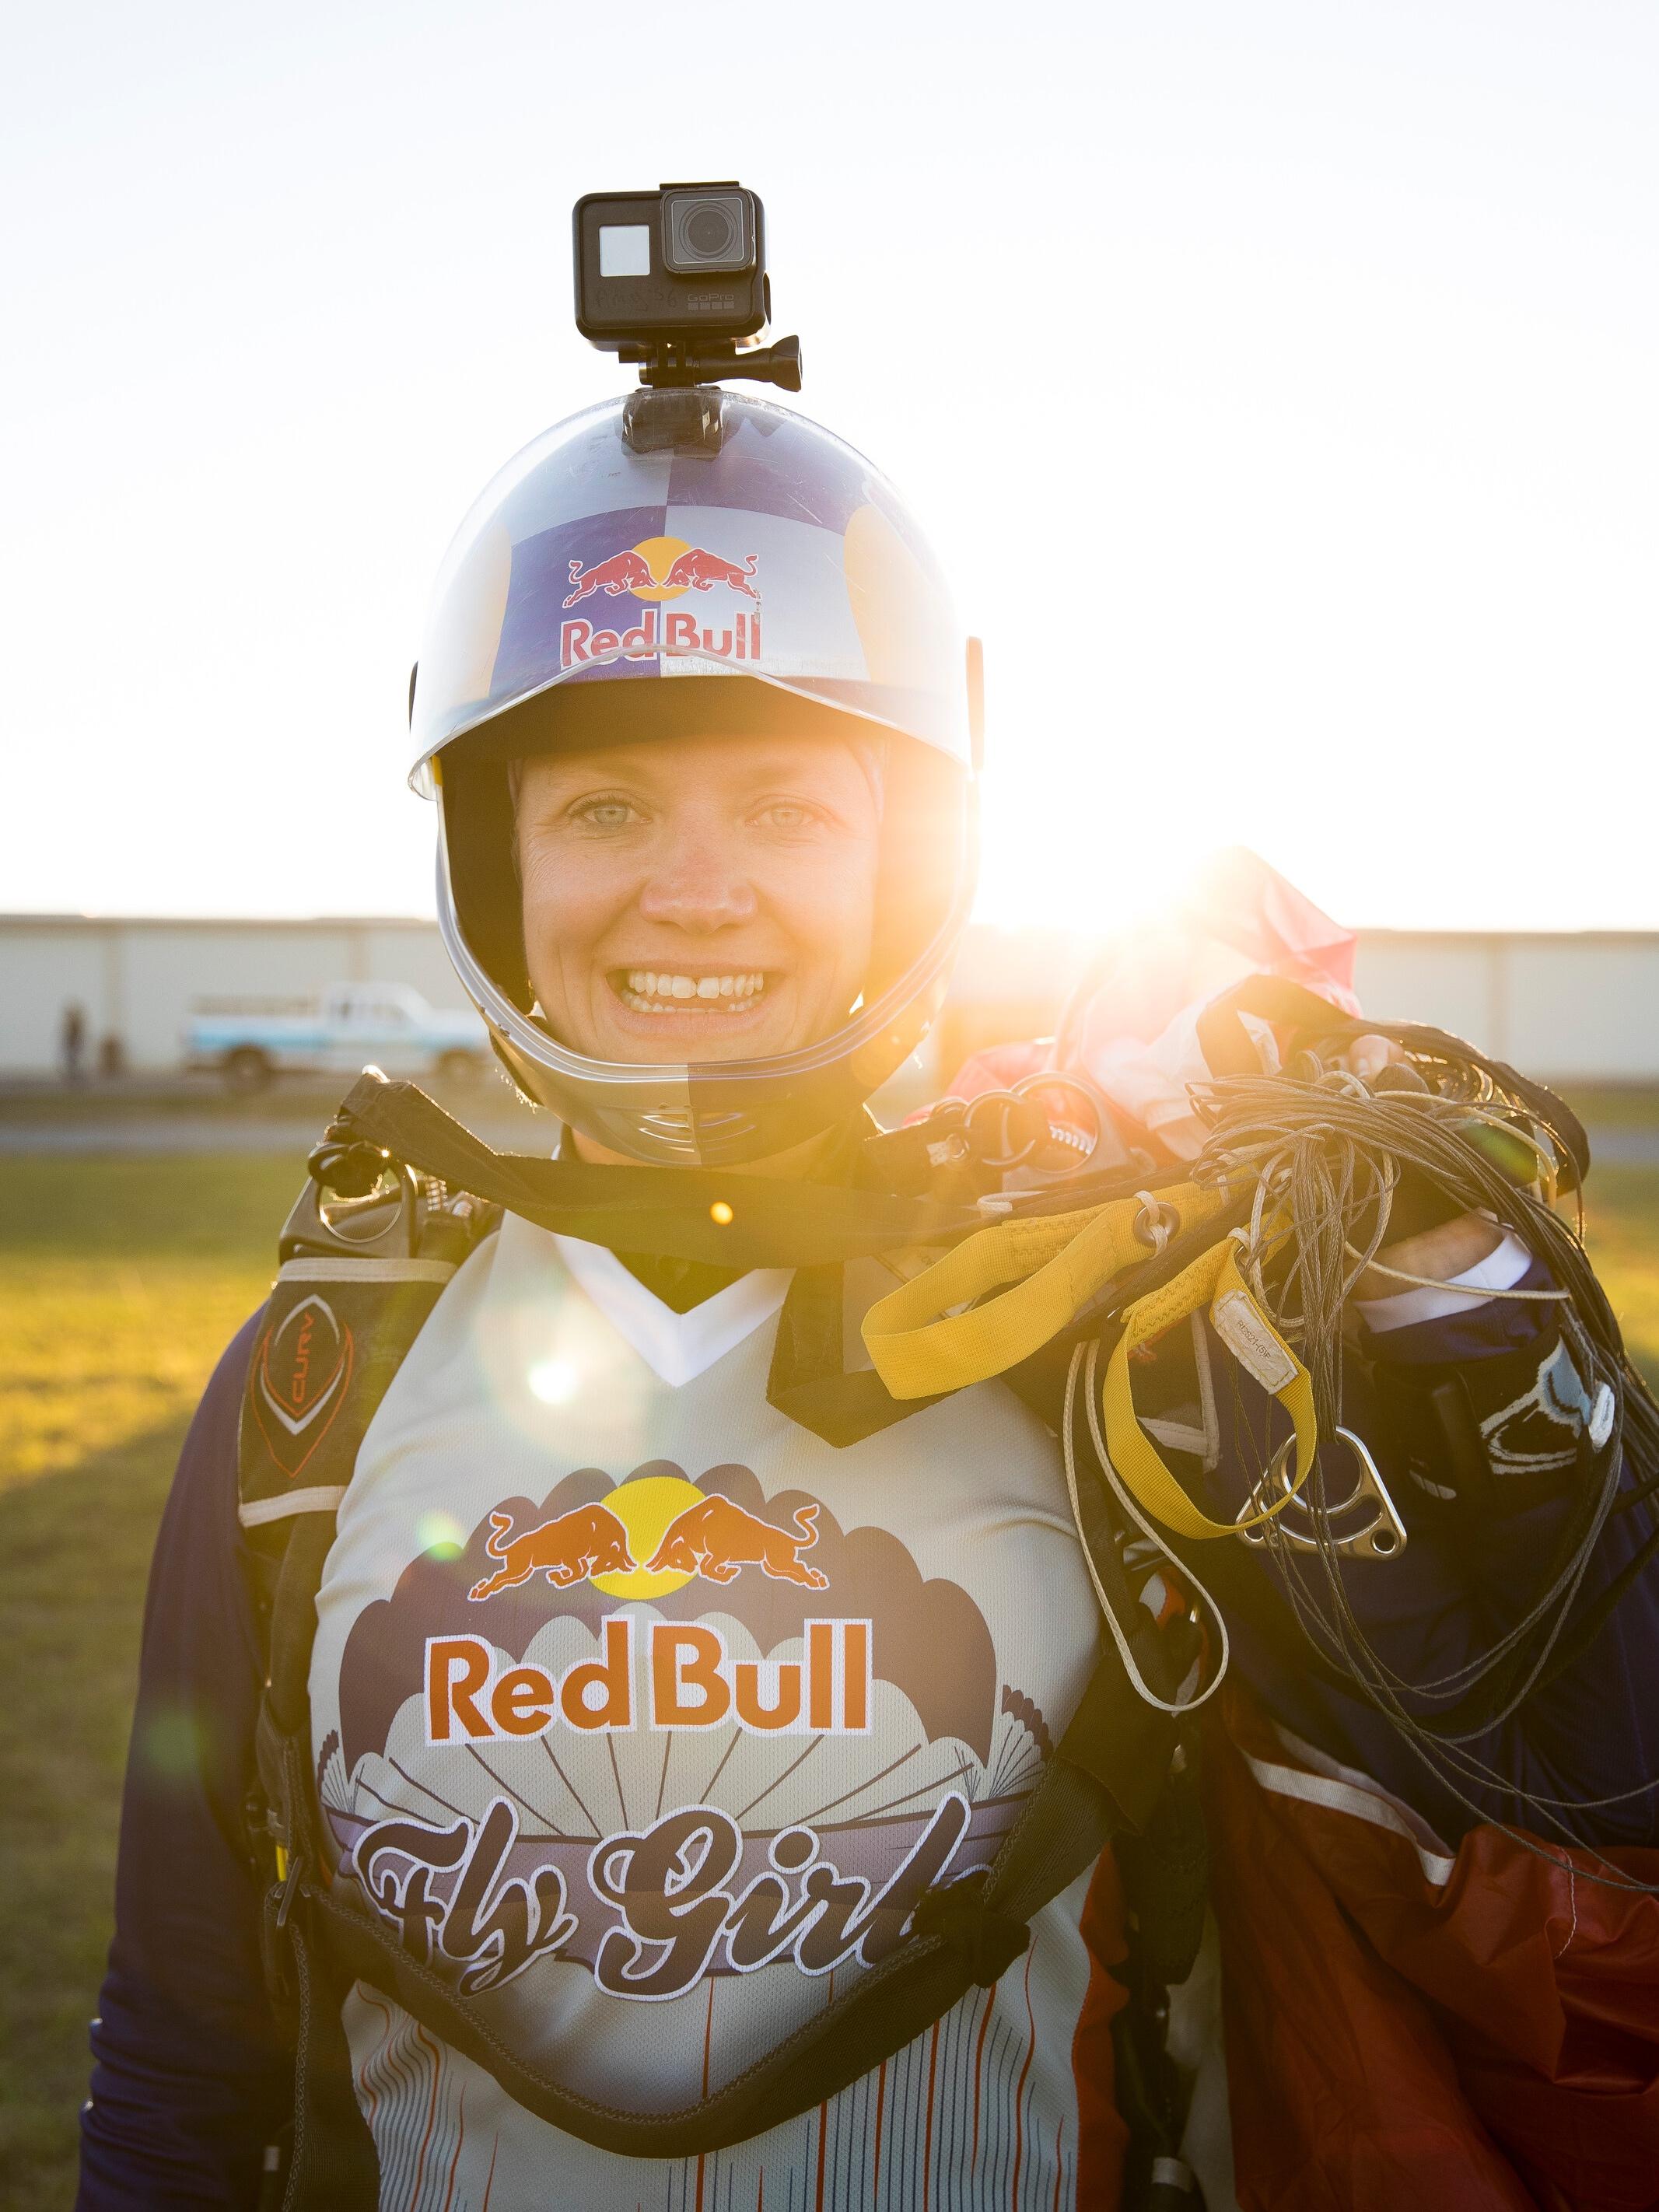 Amy Chmelecki - 19,000 Skydives17 World Records10 National Titles4 World TitlesRepresenting The USA